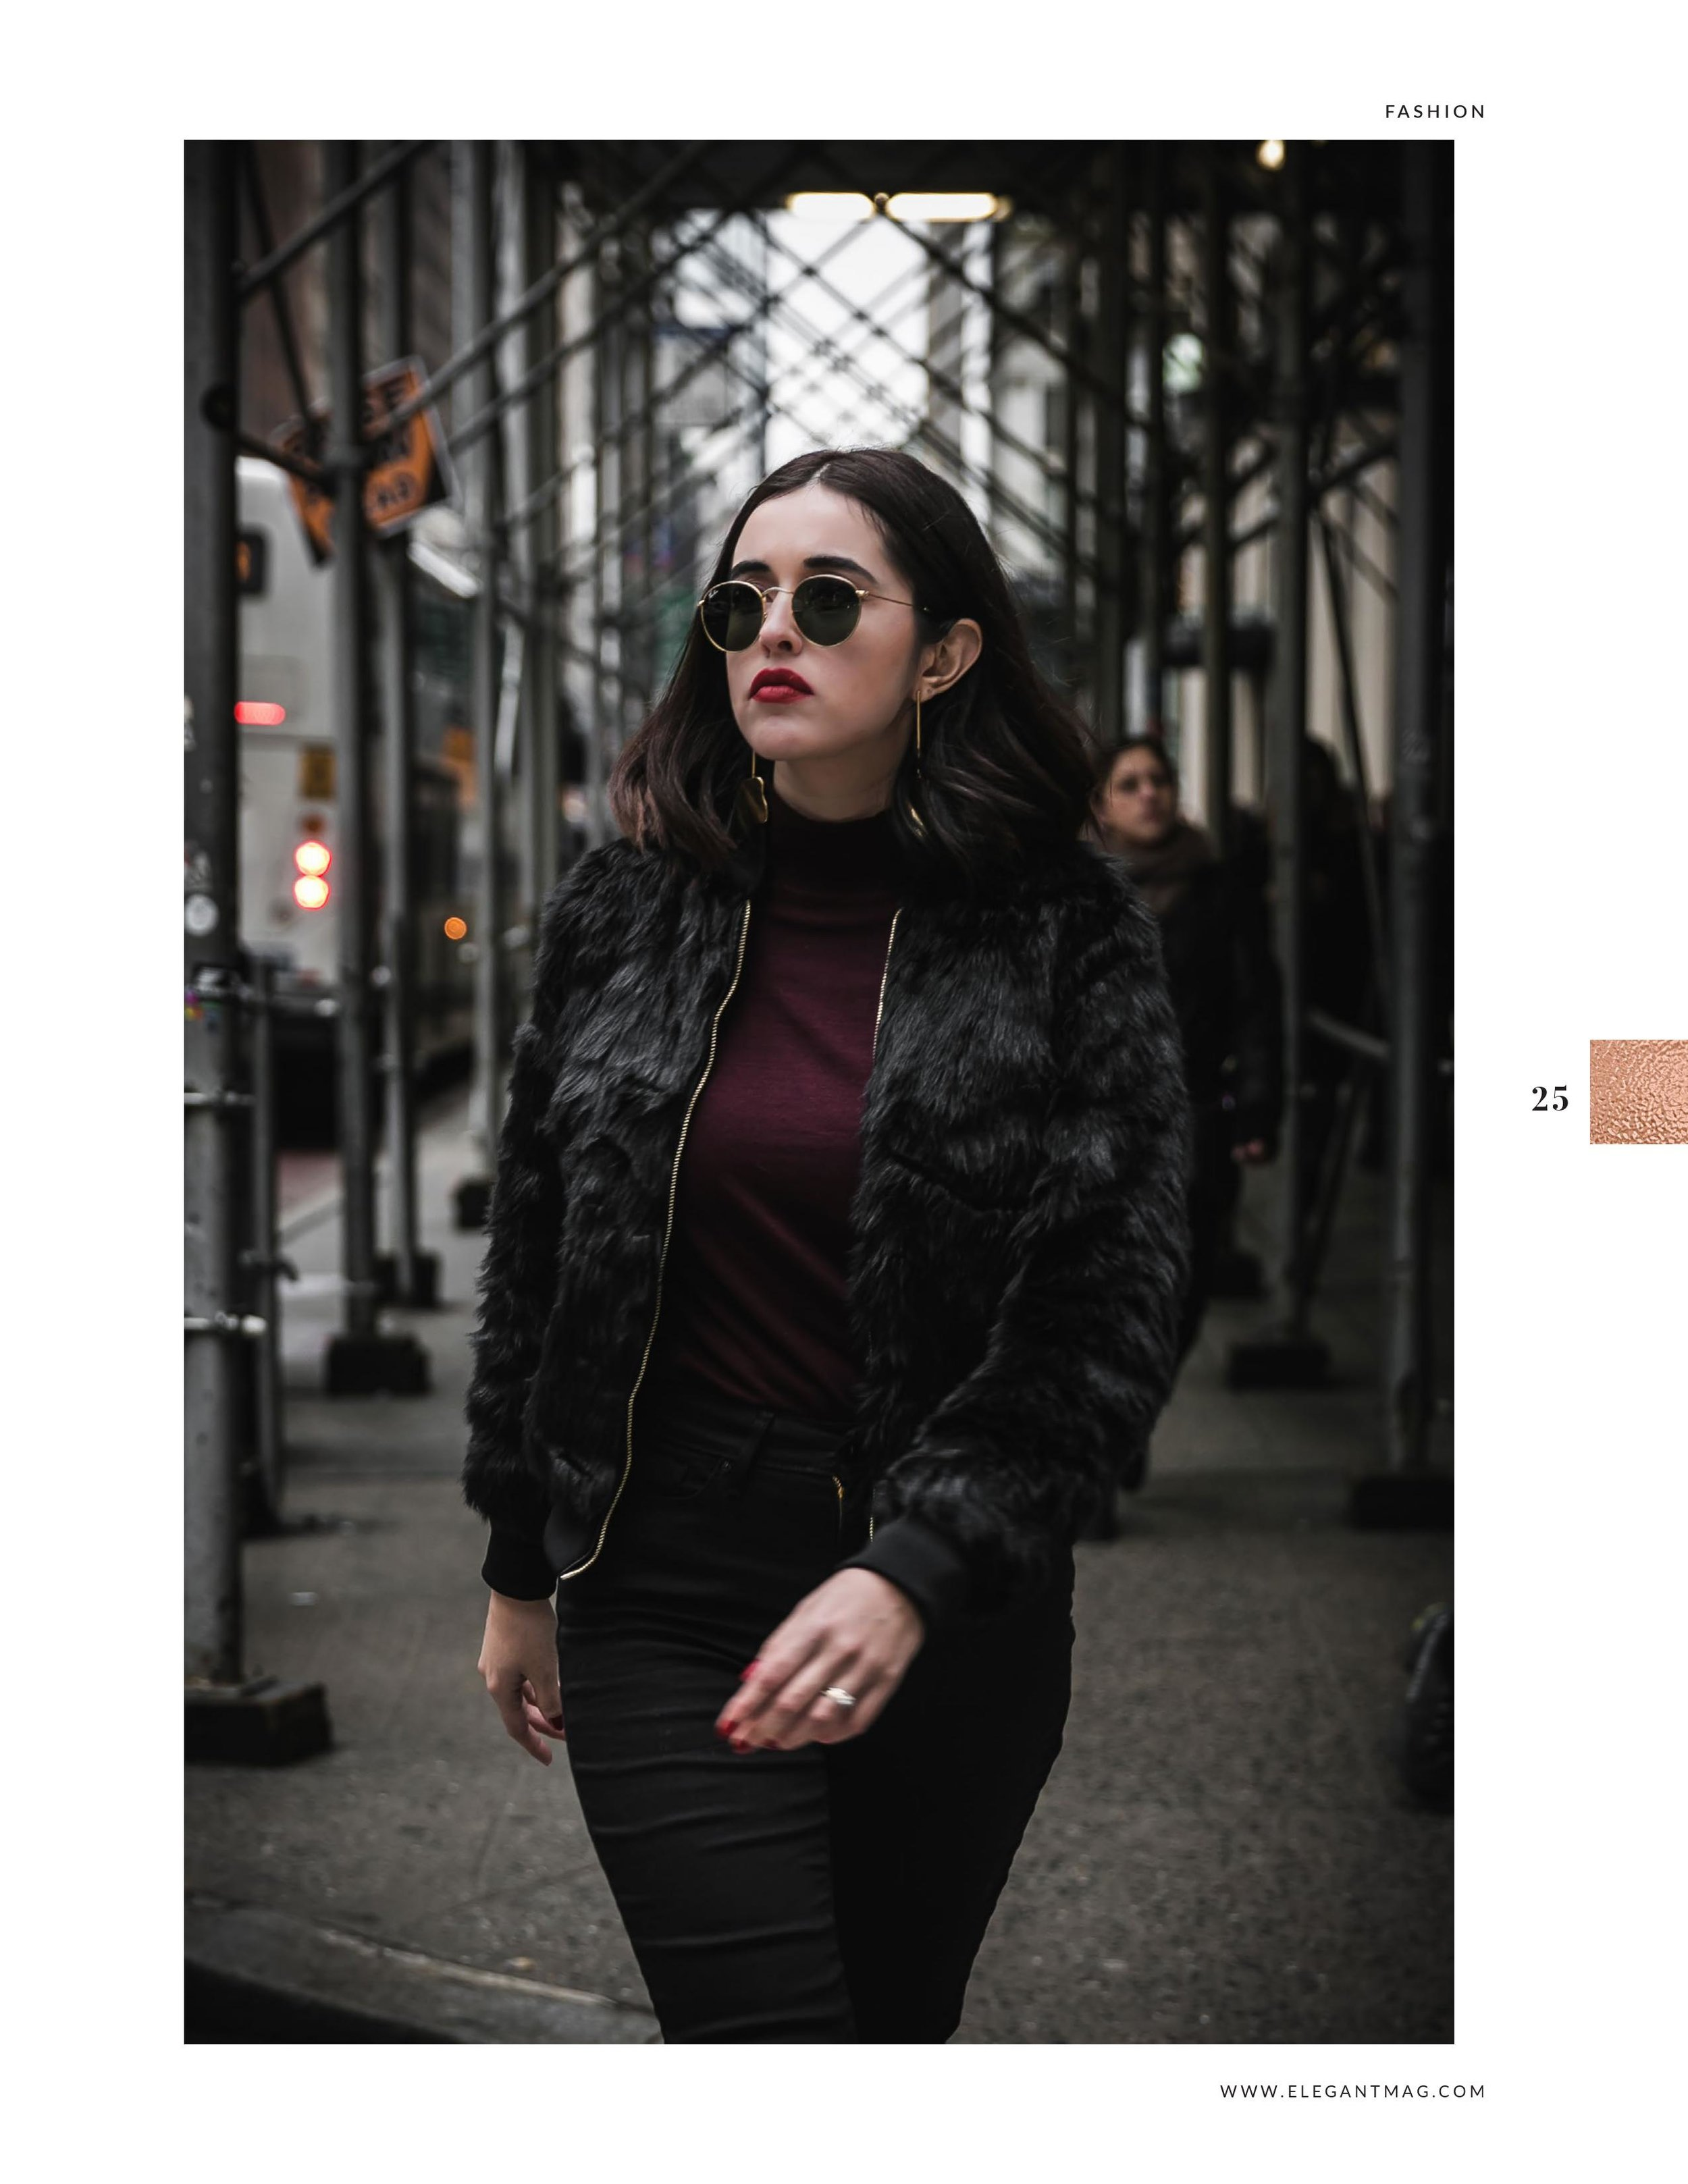 Elegant-50-4 - Single 4.jpg